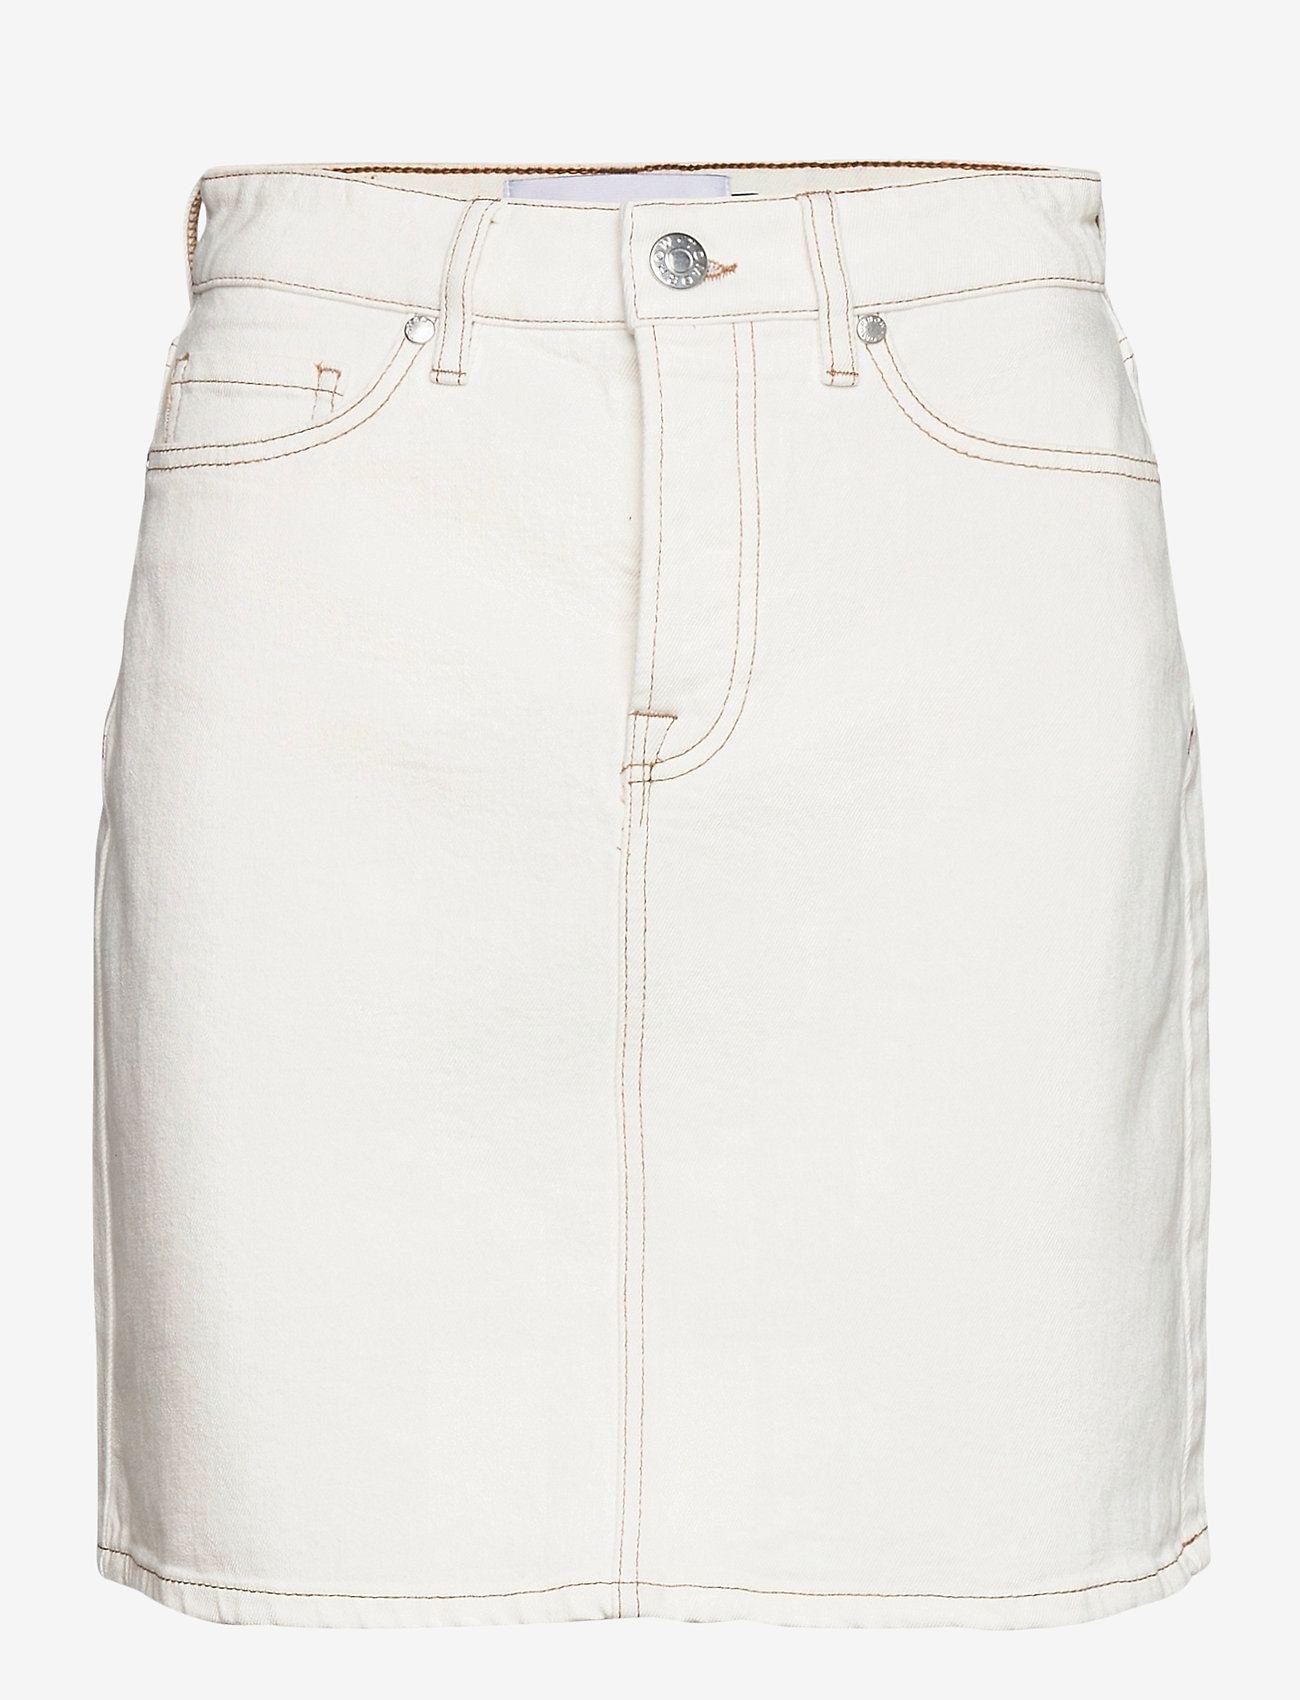 Tomorrow - Mandela denim skirt color - kurze röcke - ecru - 0